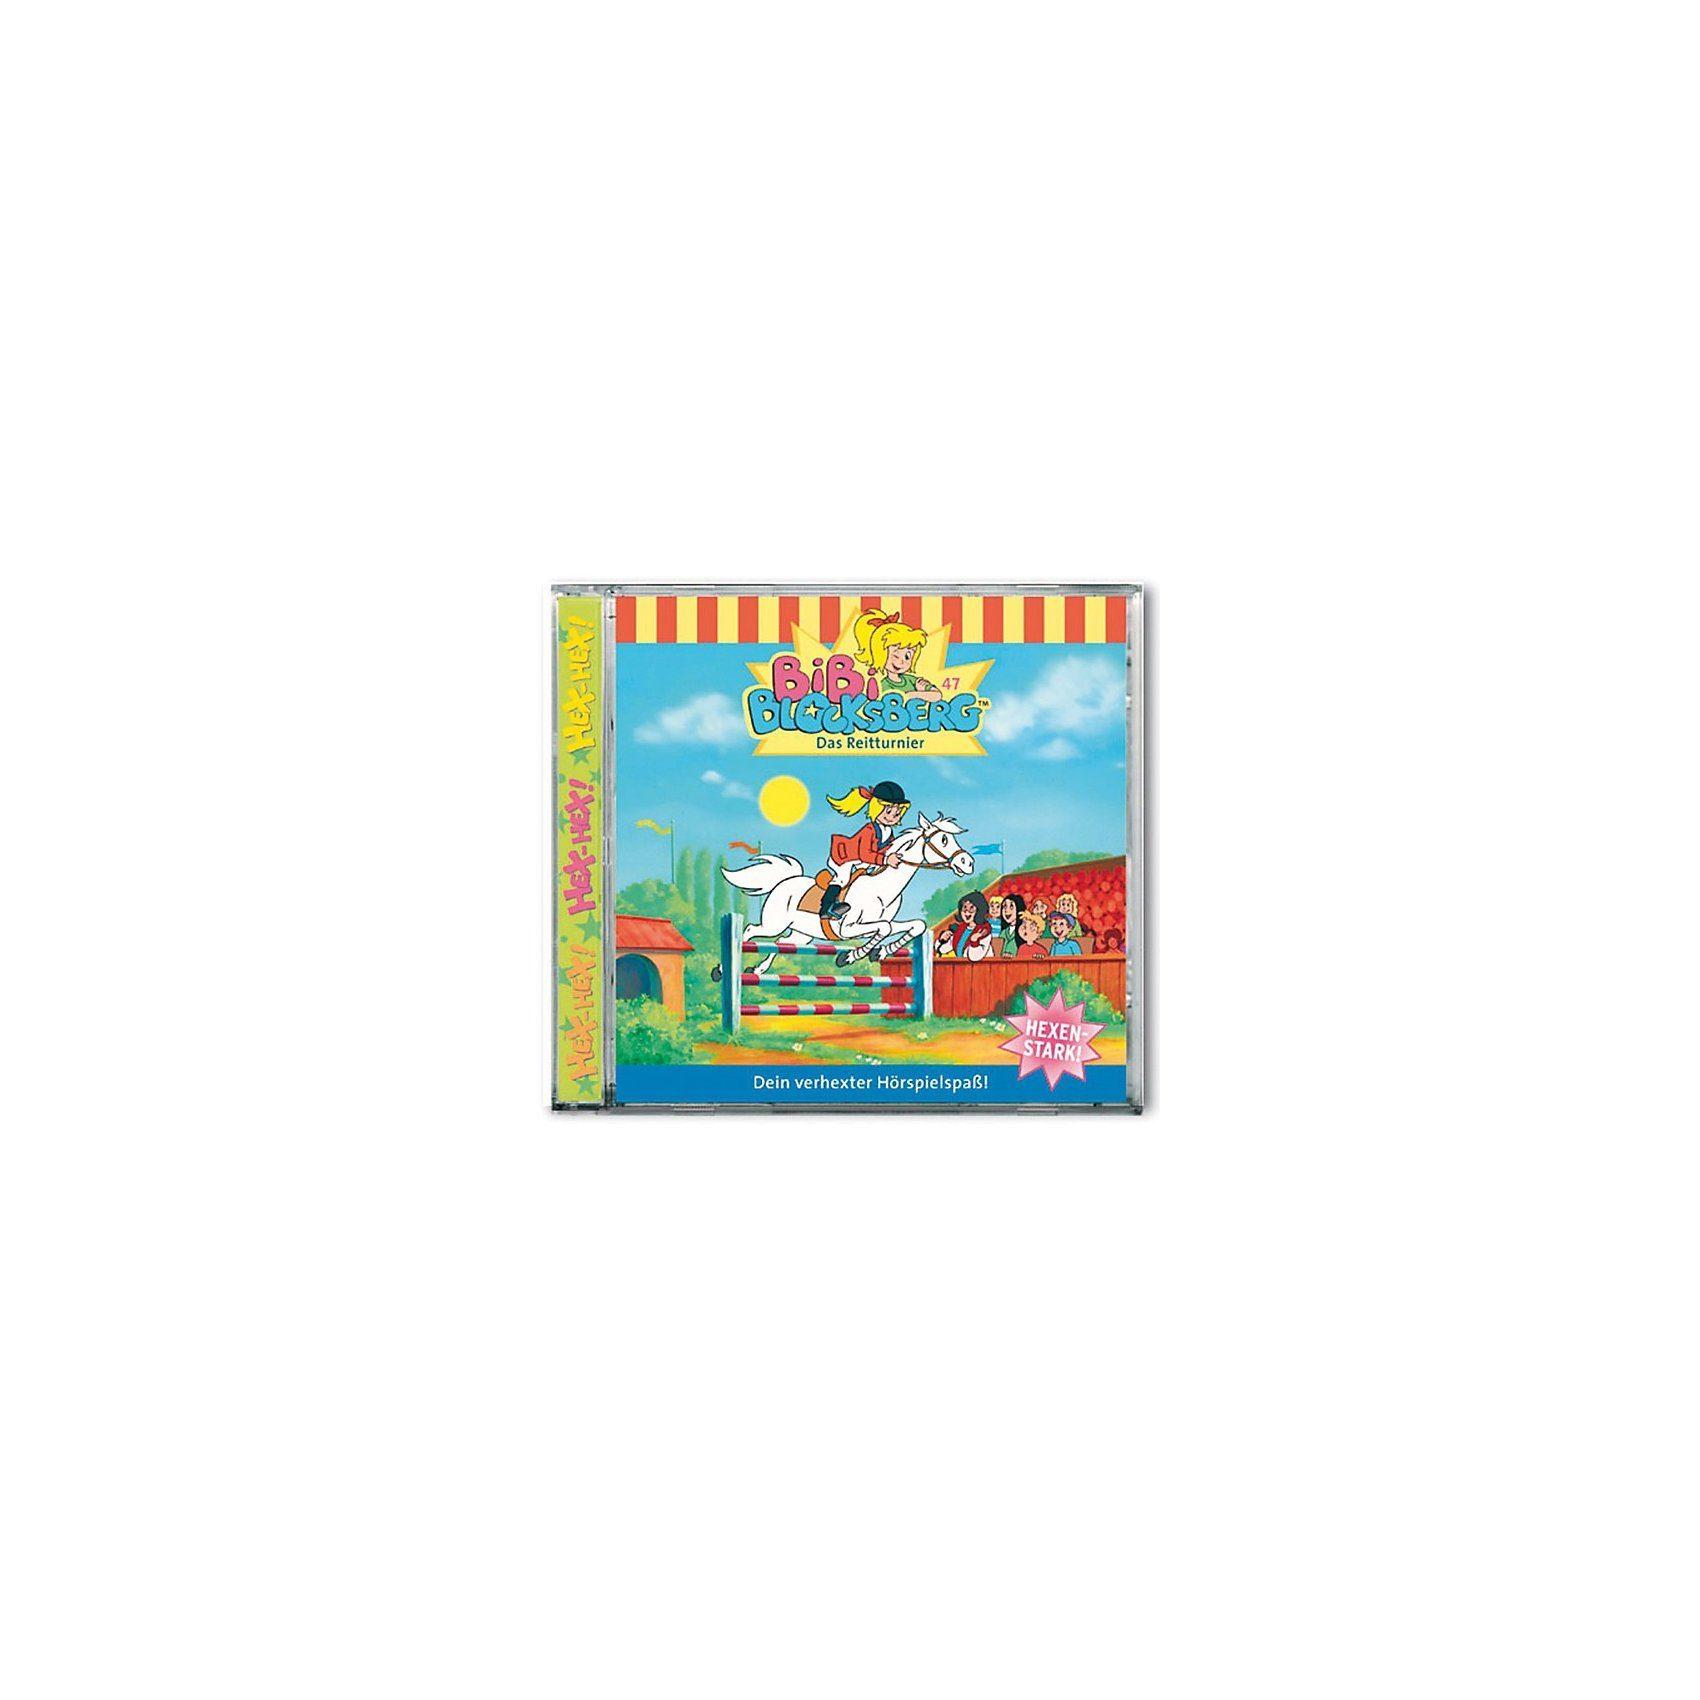 Kiddinx CD Bibi Blocksberg 47 (Das Reitturnier)